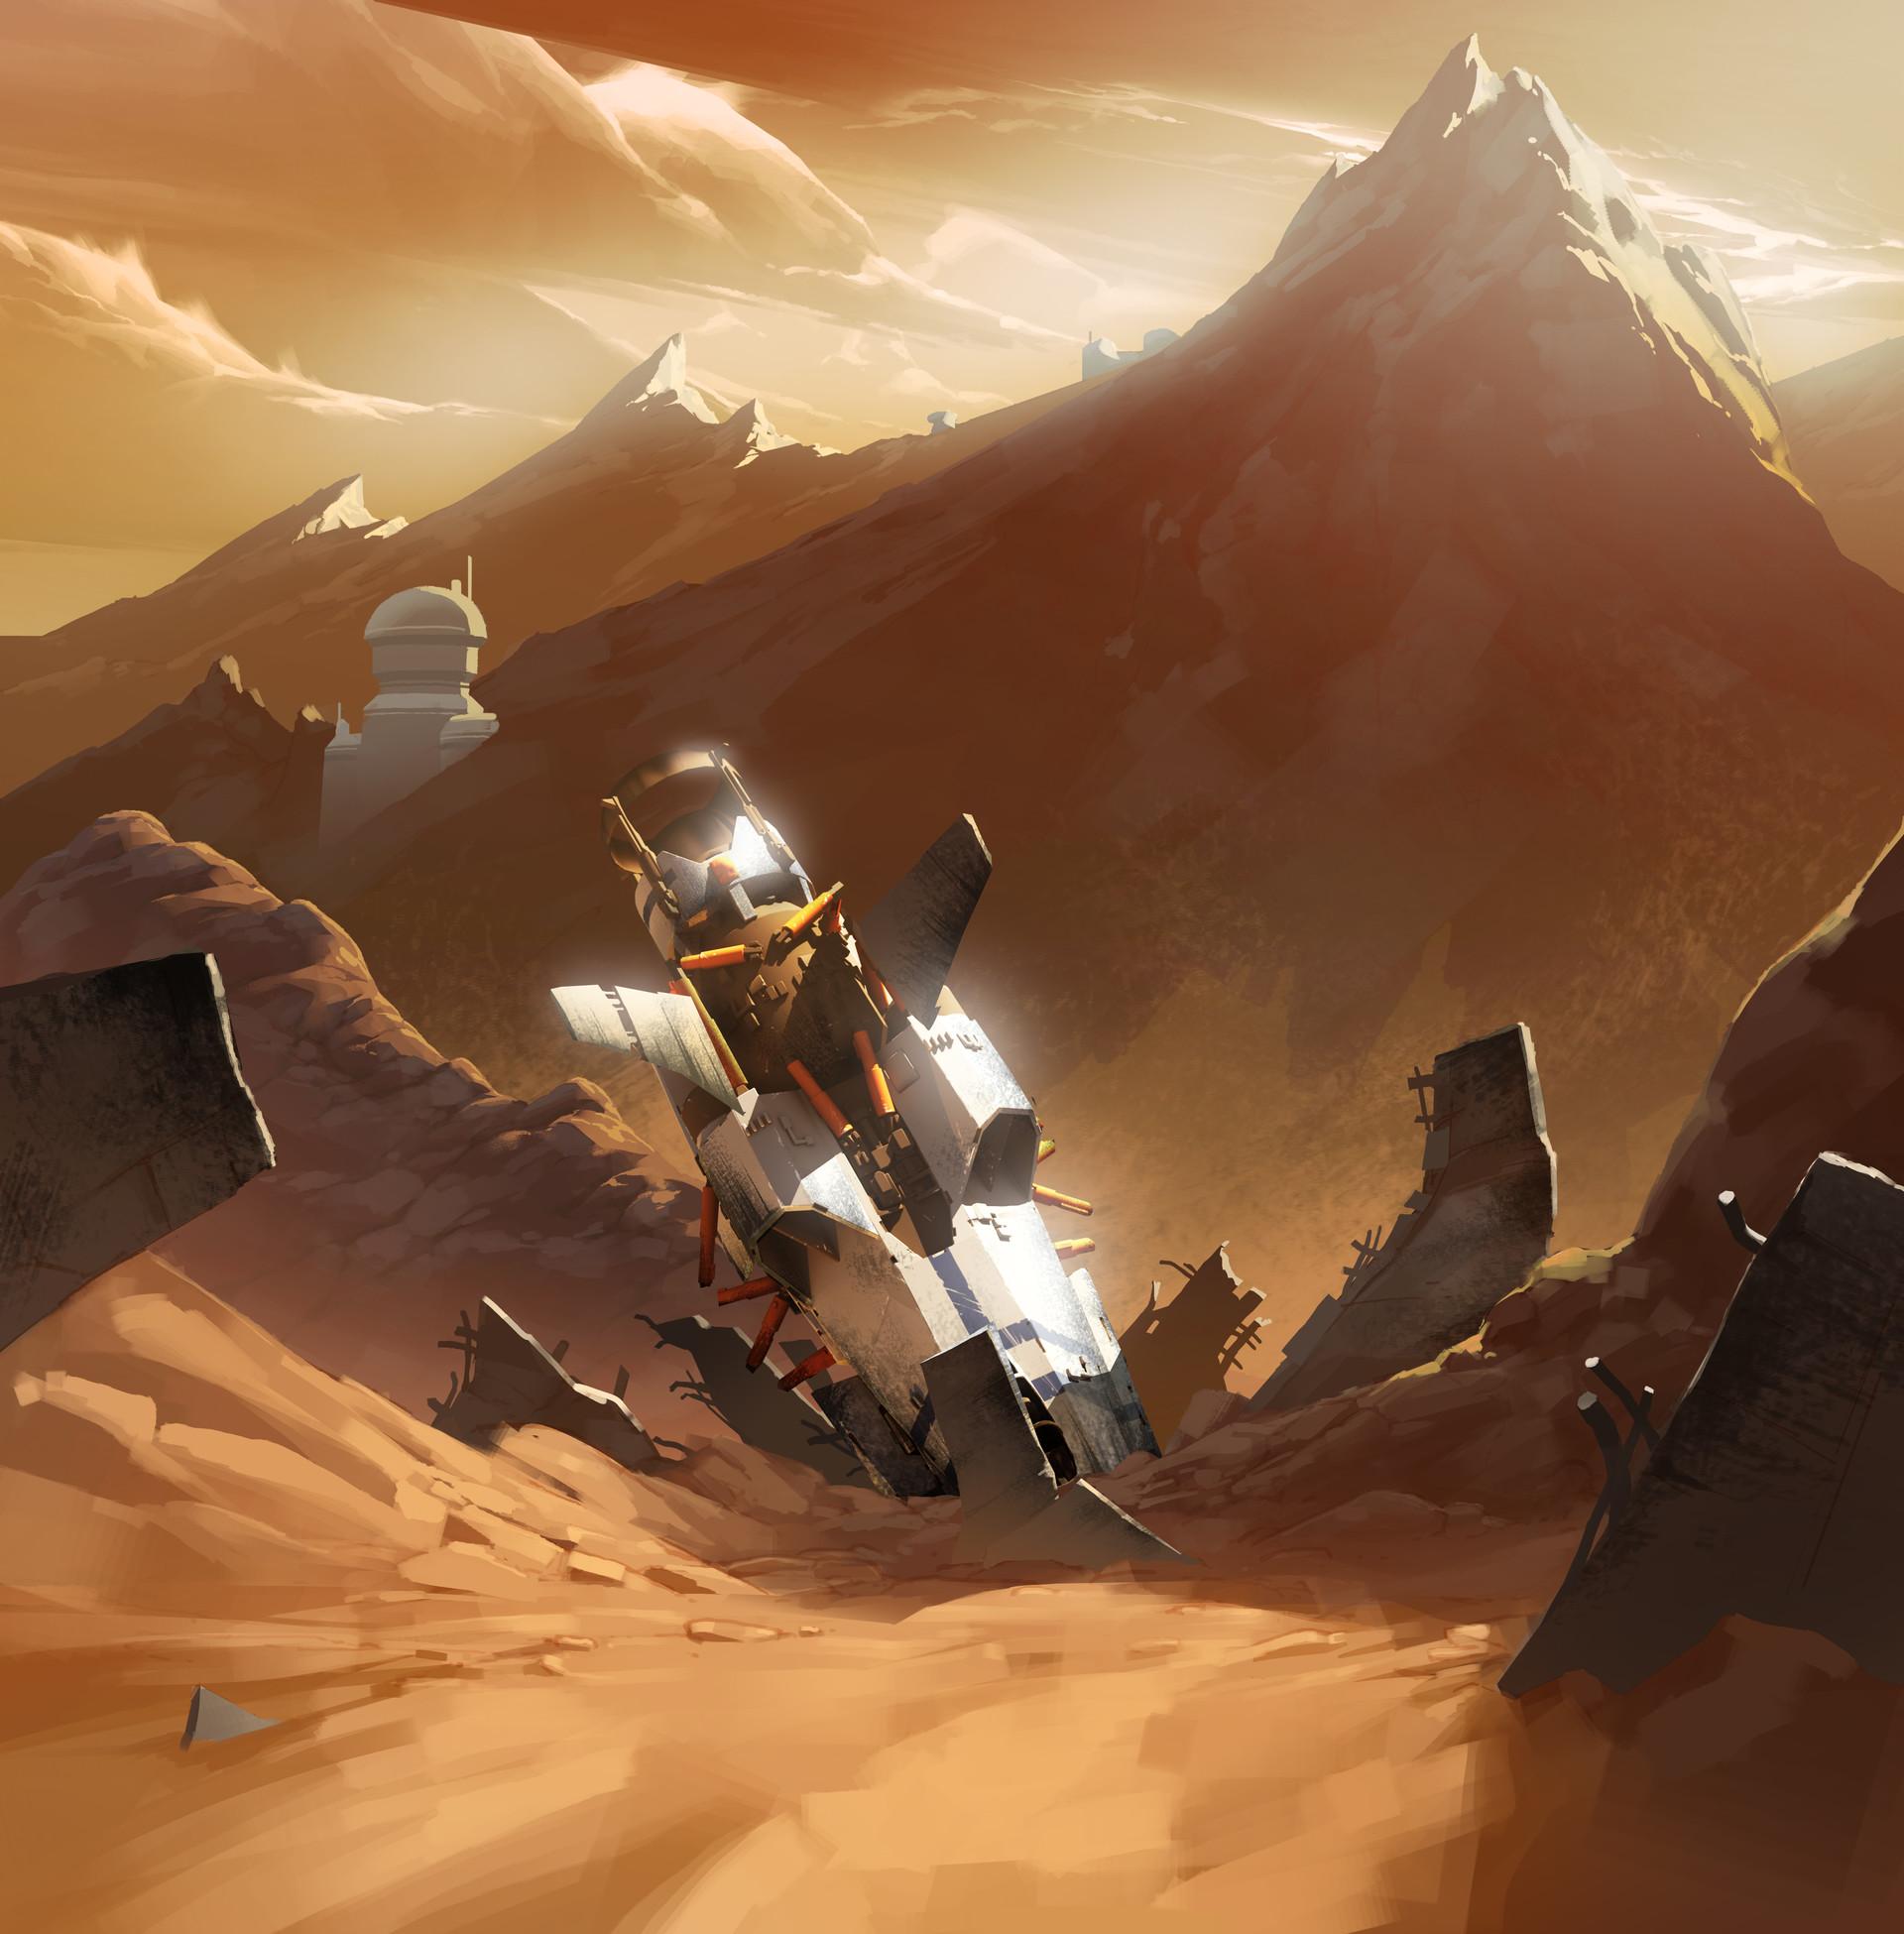 Arthur loftis rg000 bg a081 ext est ice planet crash site rough v7 al